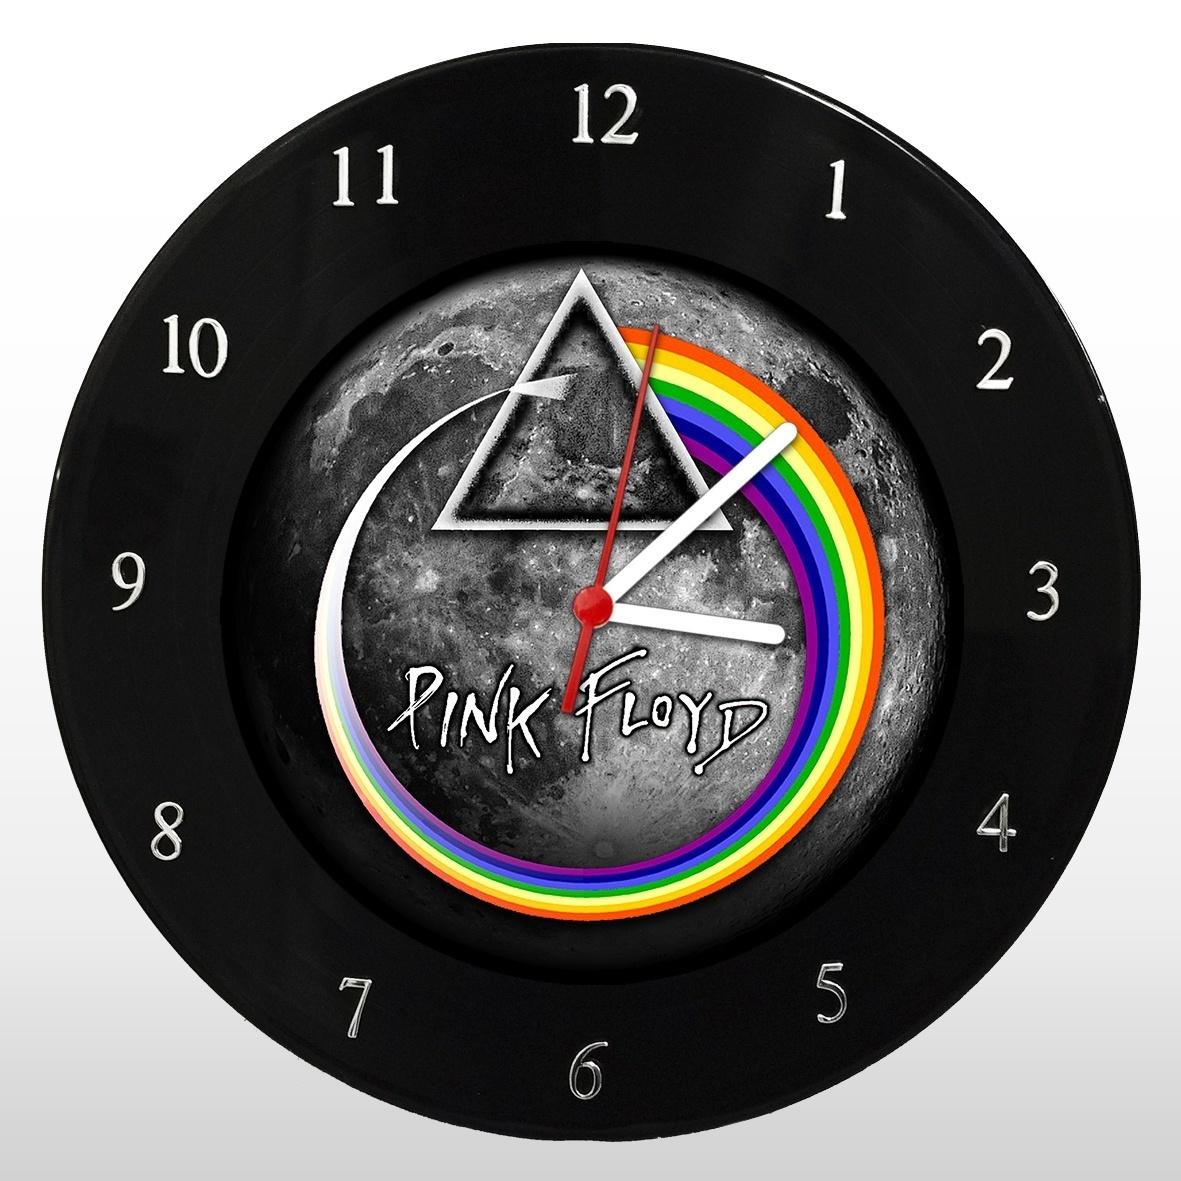 Pink Floyd - Dark Side - Relógio de Parede em Disco de Vinil - Mr. Rock